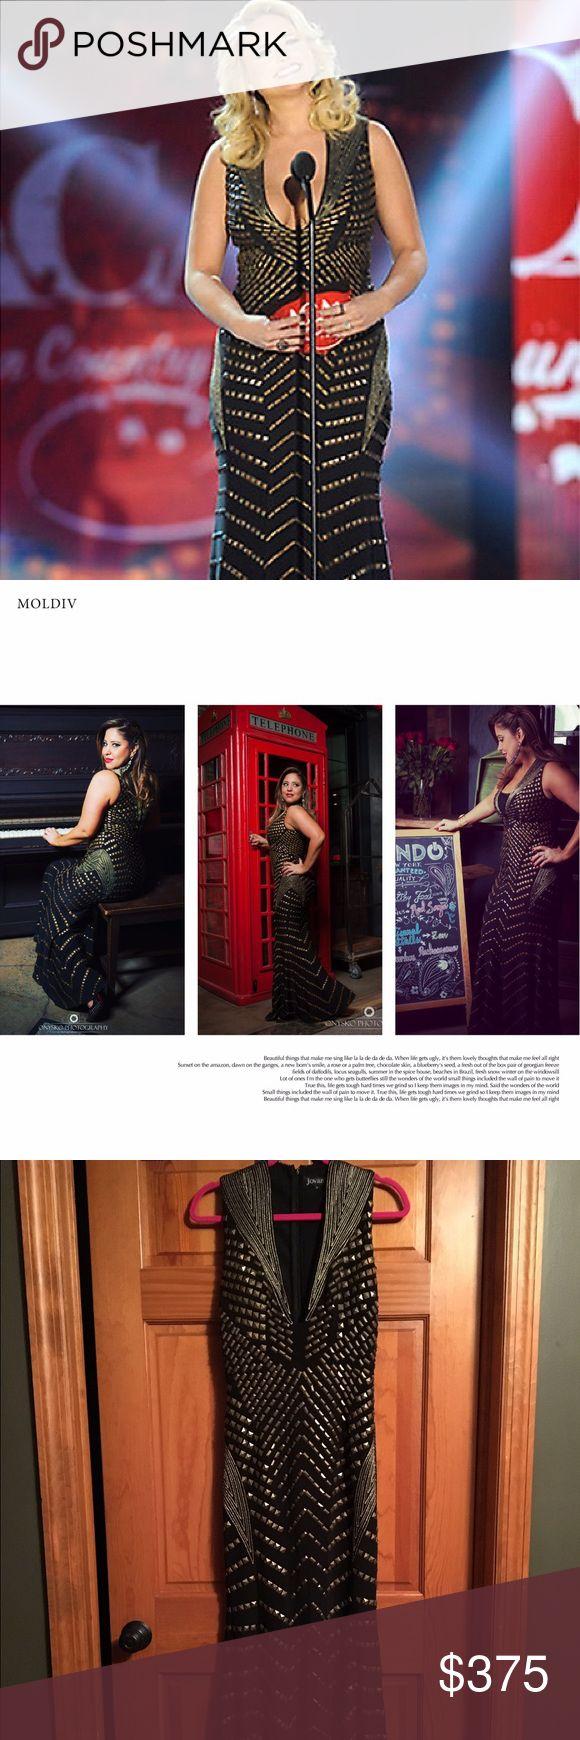 Jovani Gold and Black studded dress Long gold and black studded dress worn once. Jovani Dresses Prom